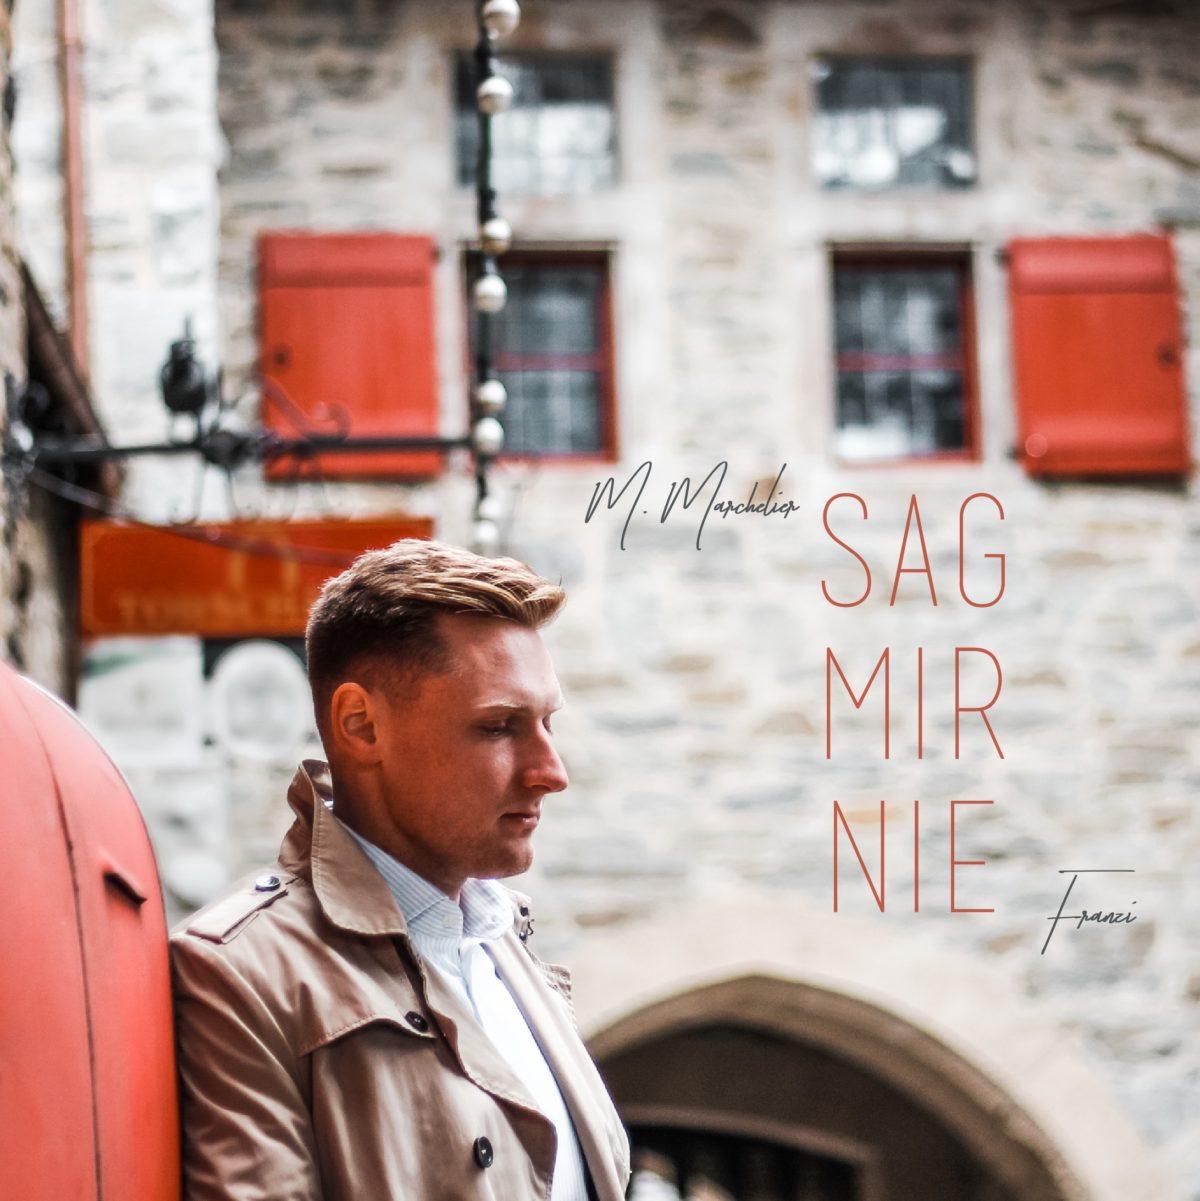 M. Marchelier – Sag mir nie (feat. Franzi)